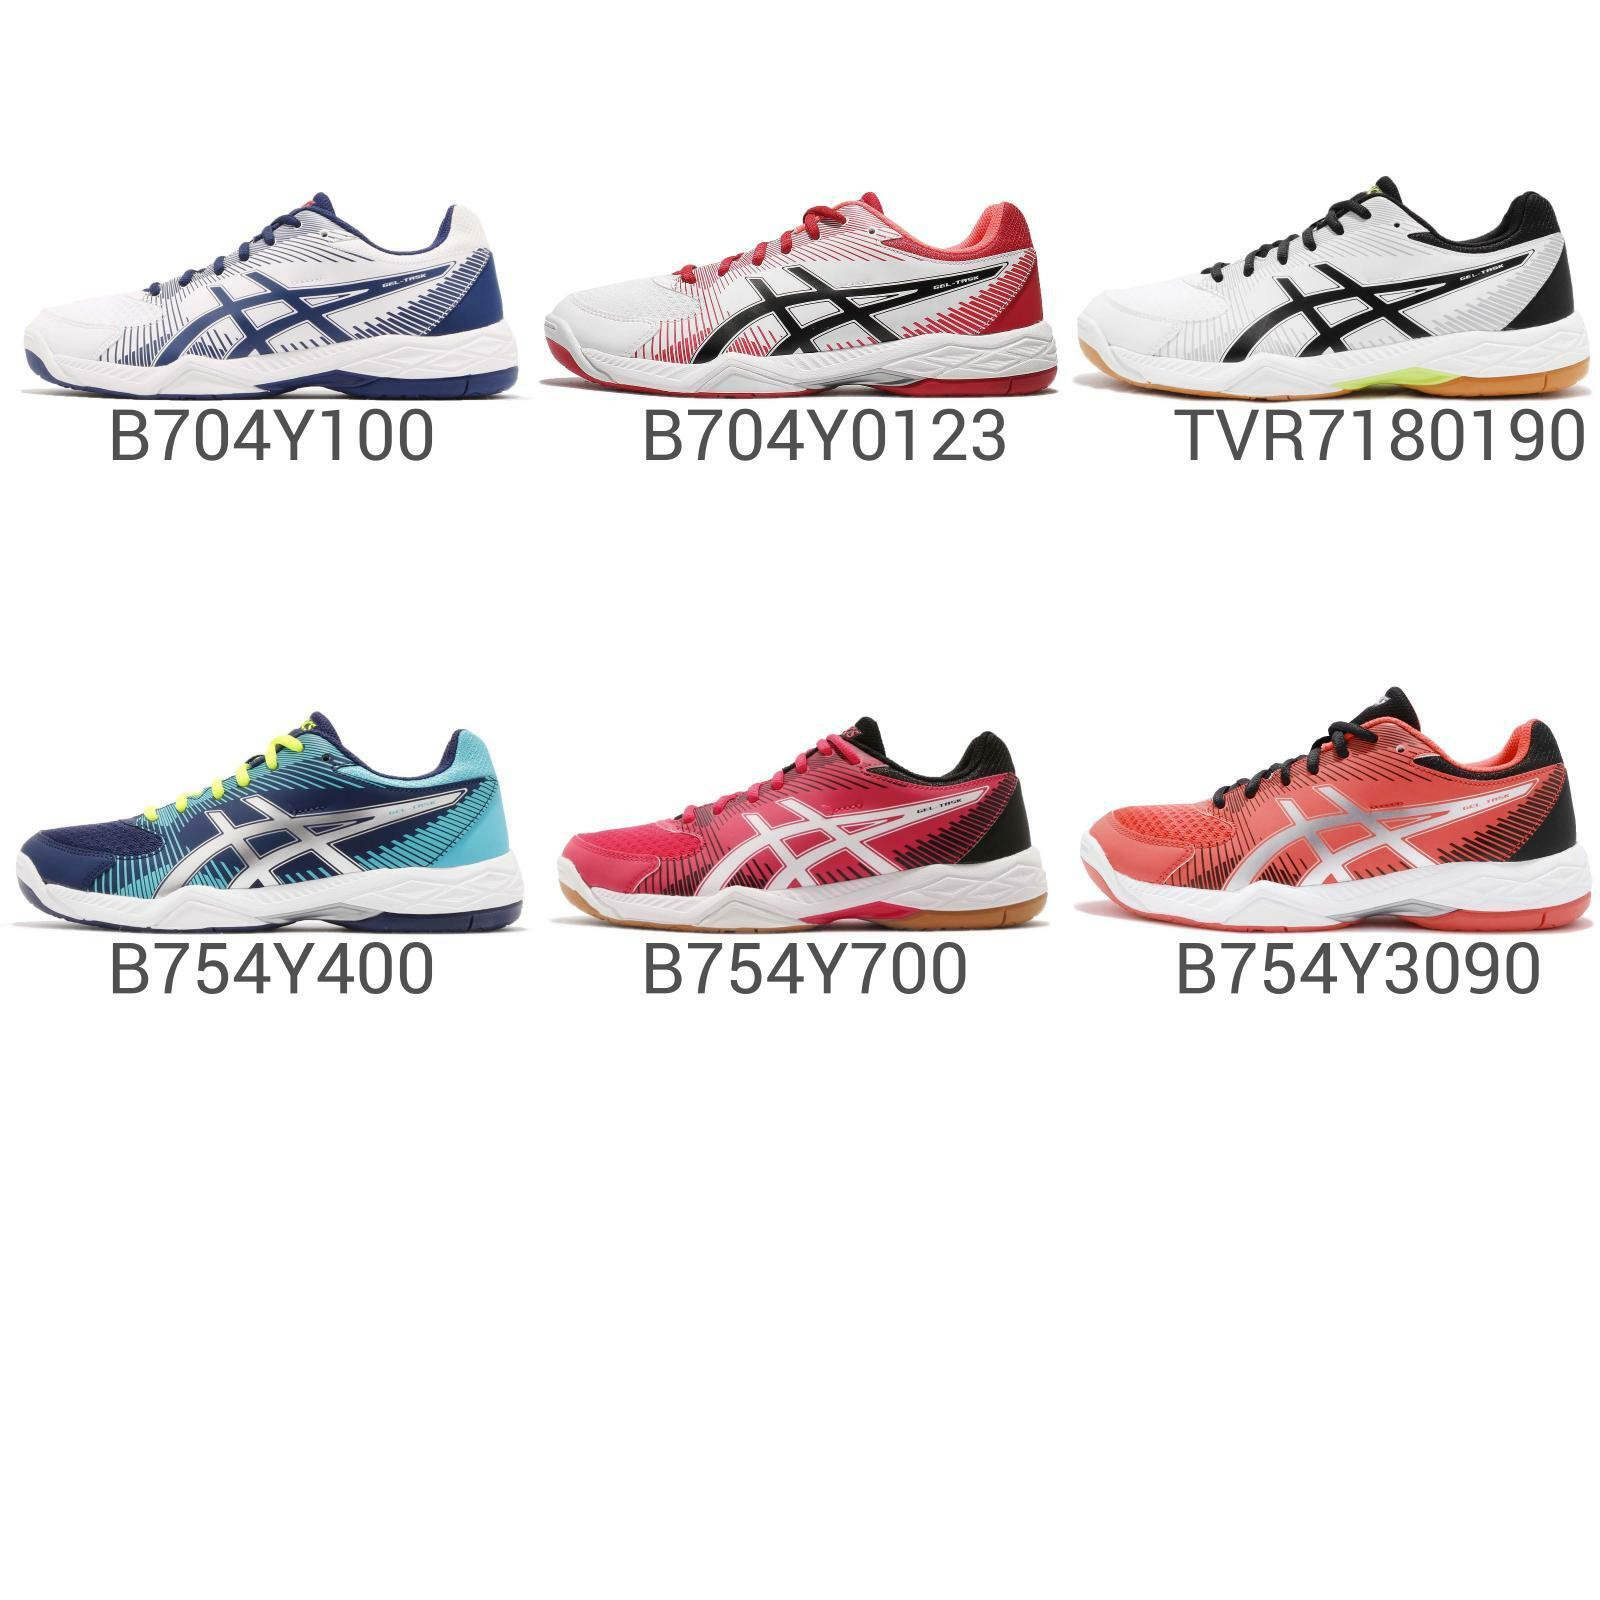 Asics Gel-Task Mens mujer Volleyball Badminton zapatos Pick 1